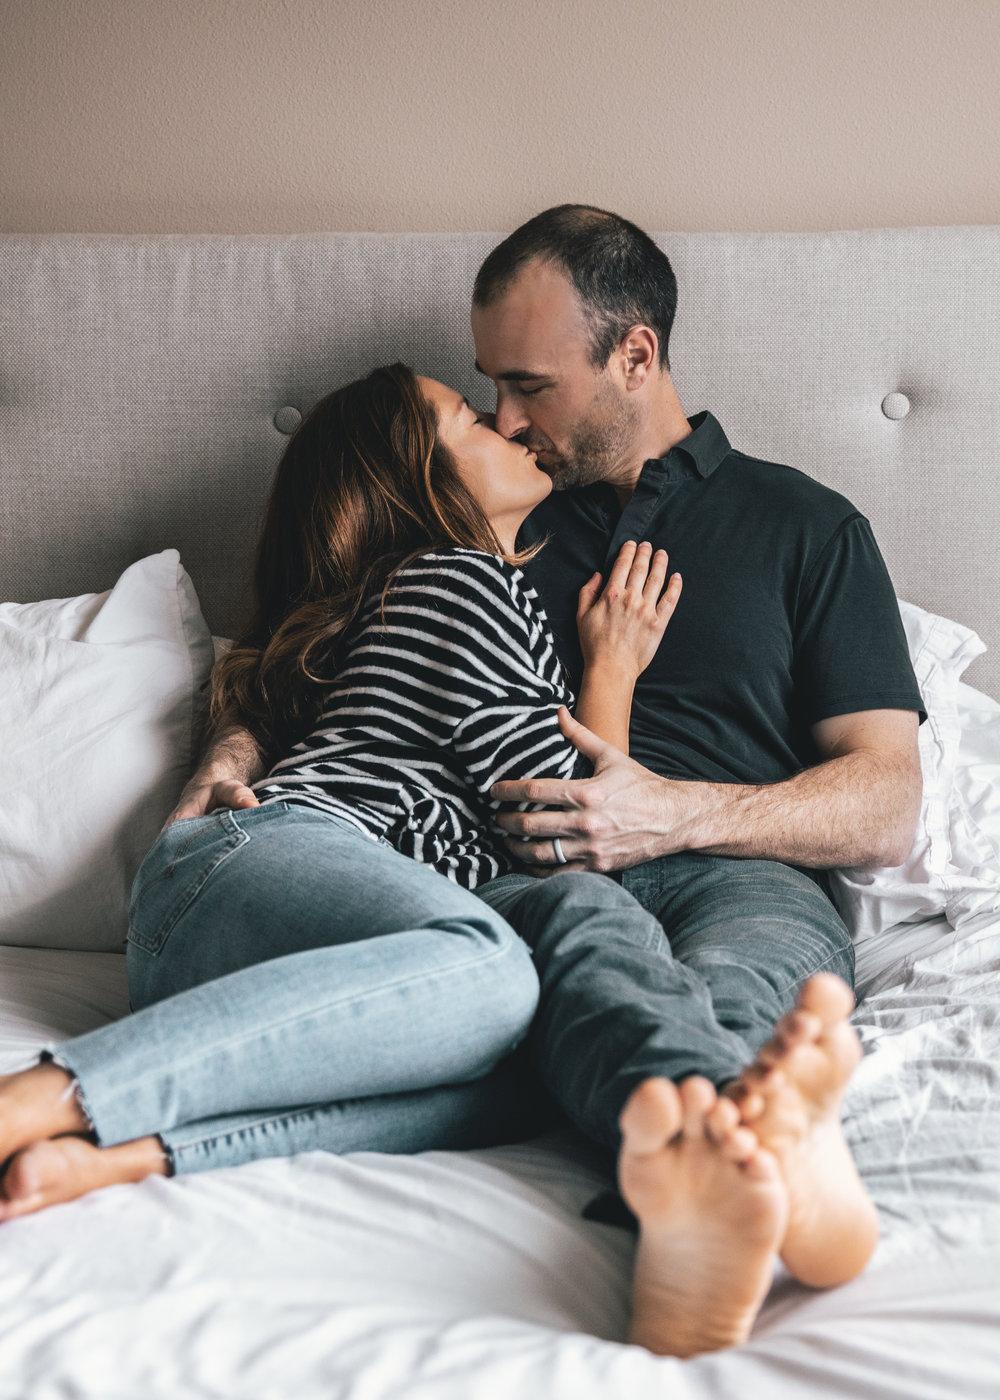 couples-20.jpg